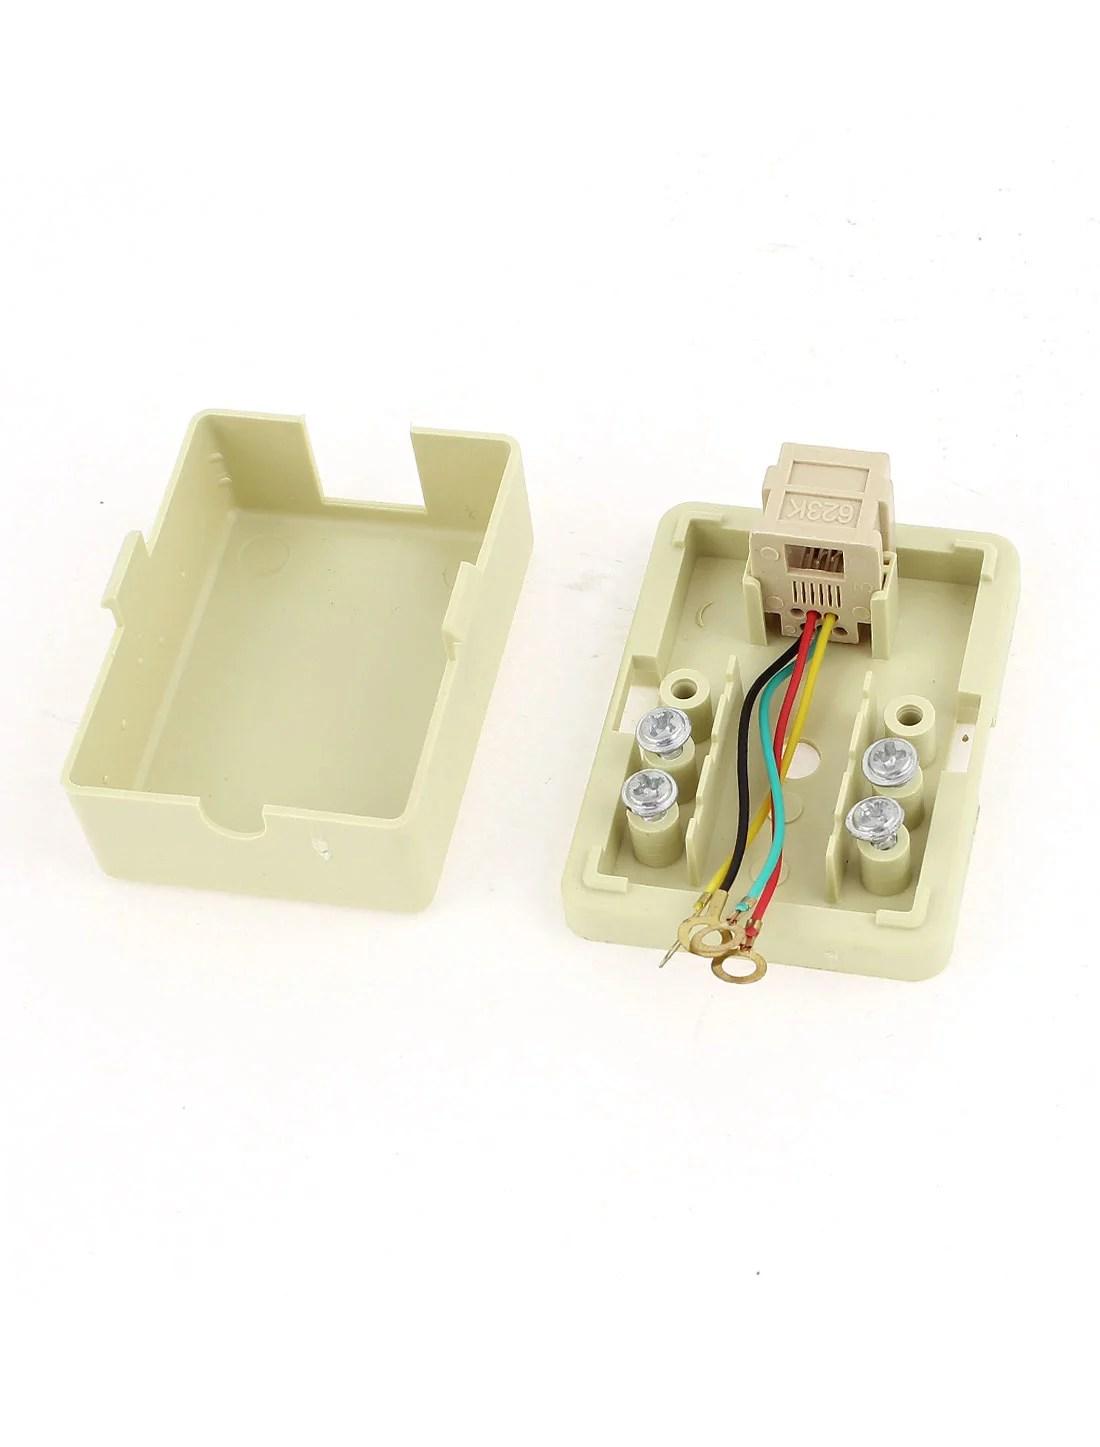 wall mount keystone single port telephone phone jacks 6p4c rj11 walmart canada [ 2000 x 2000 Pixel ]